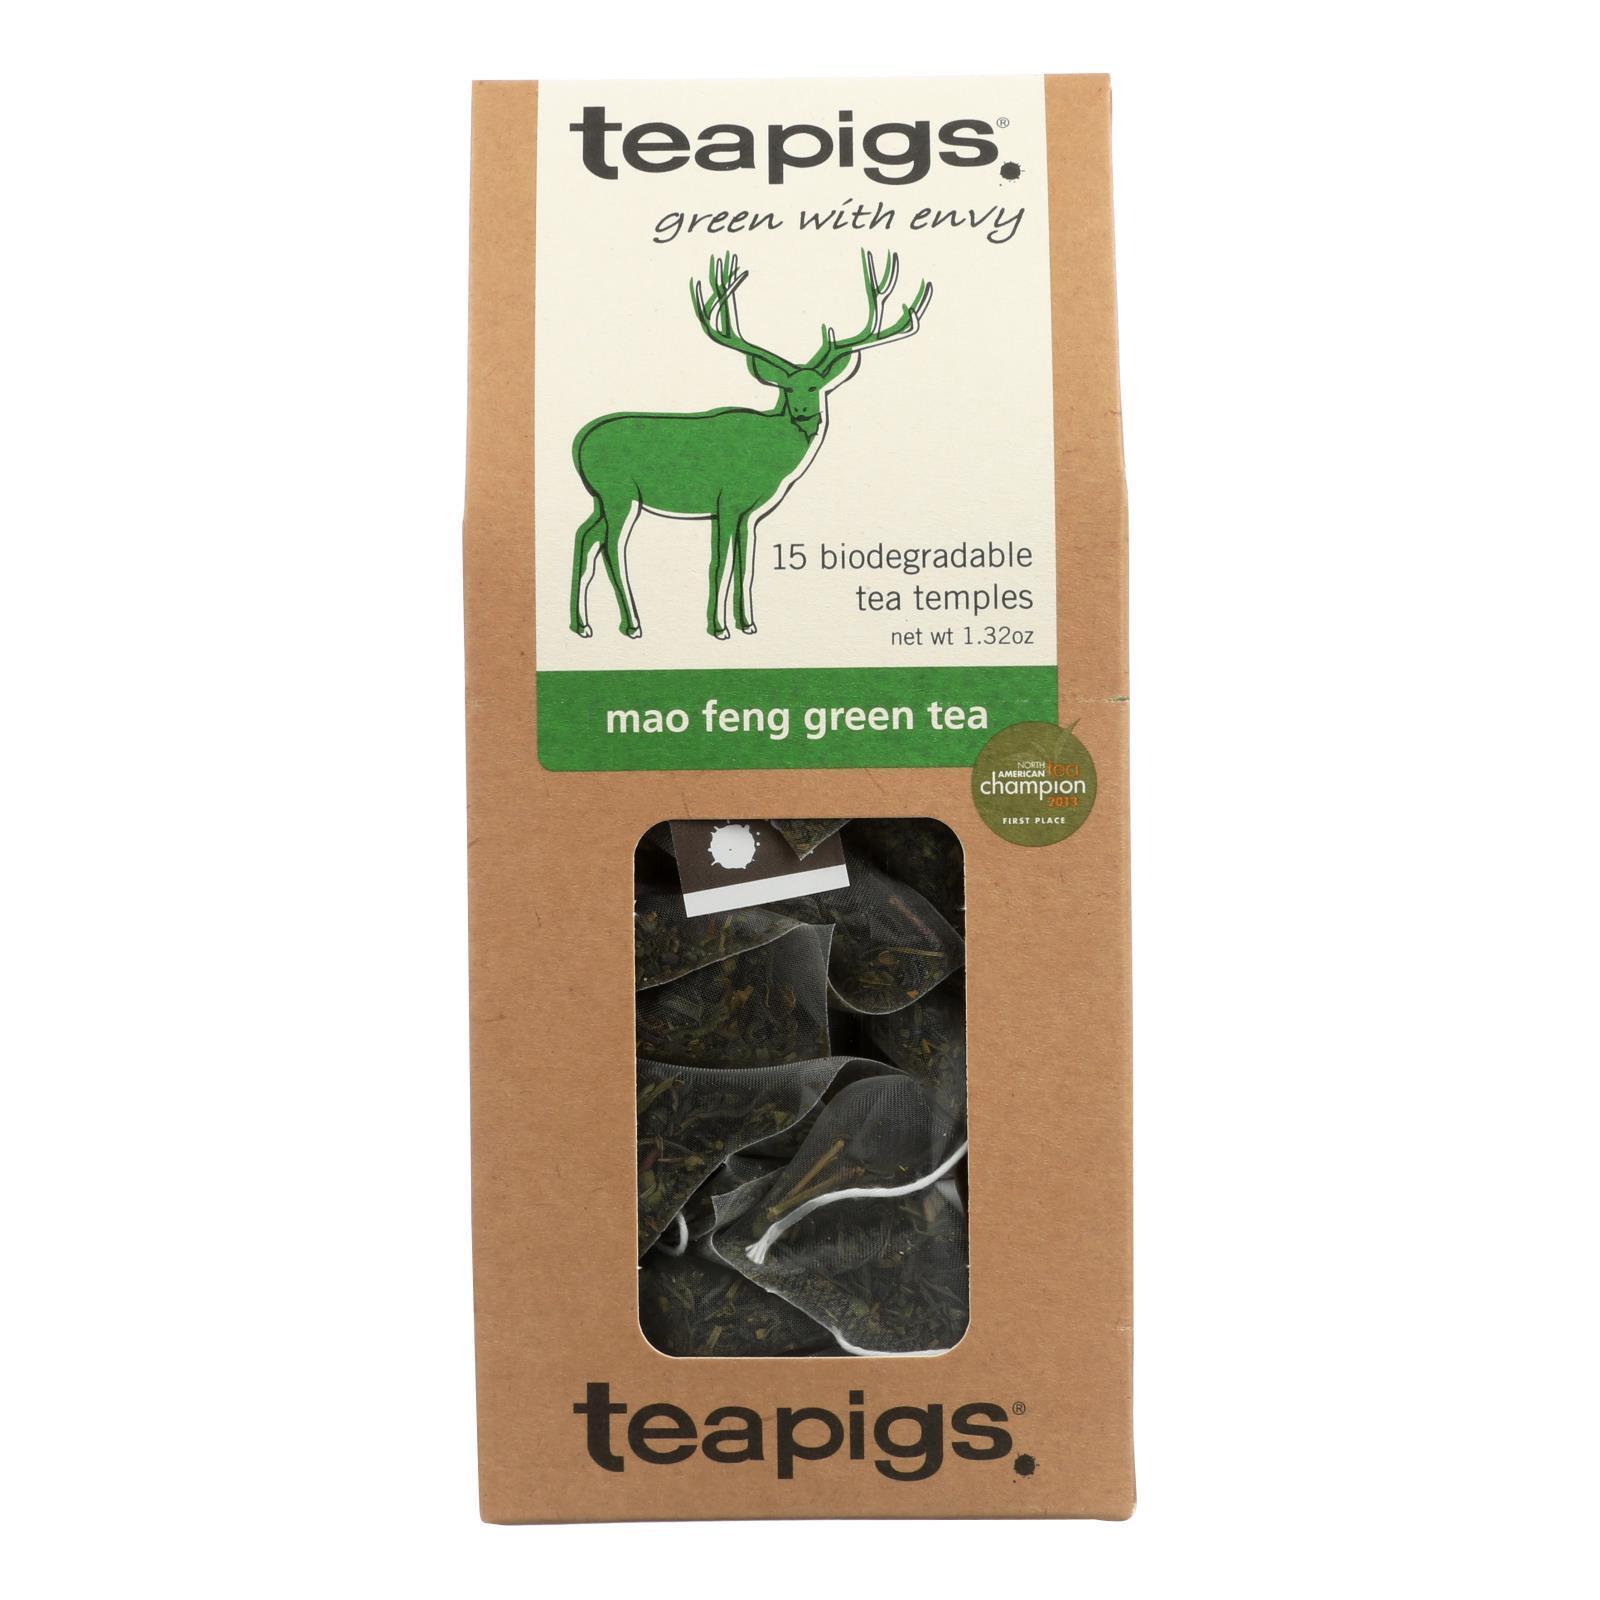 Teapigs Green Tea - Mao Feng - Case of 6 - 15 count